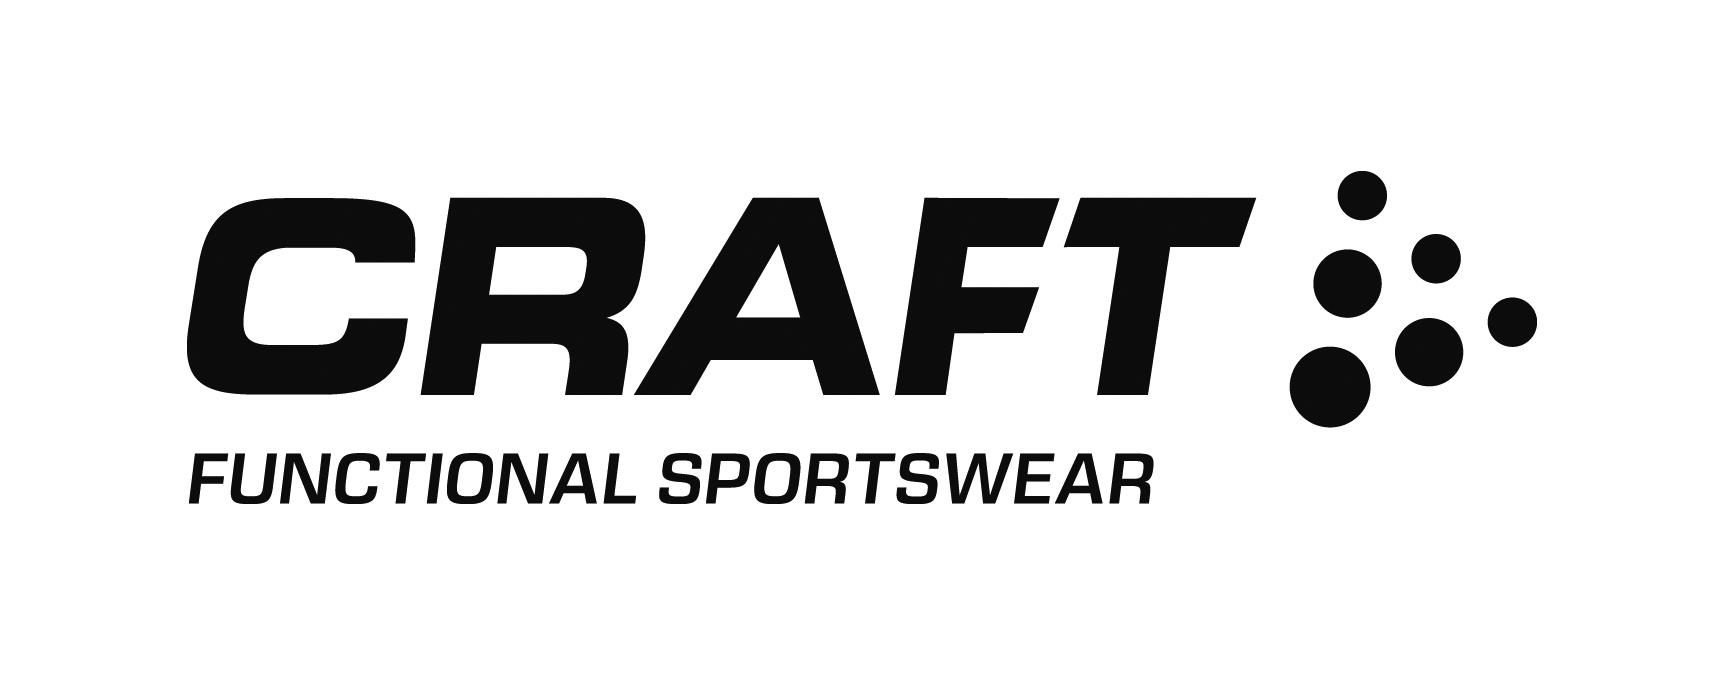 Craft_logo_FS_BLK.jpg